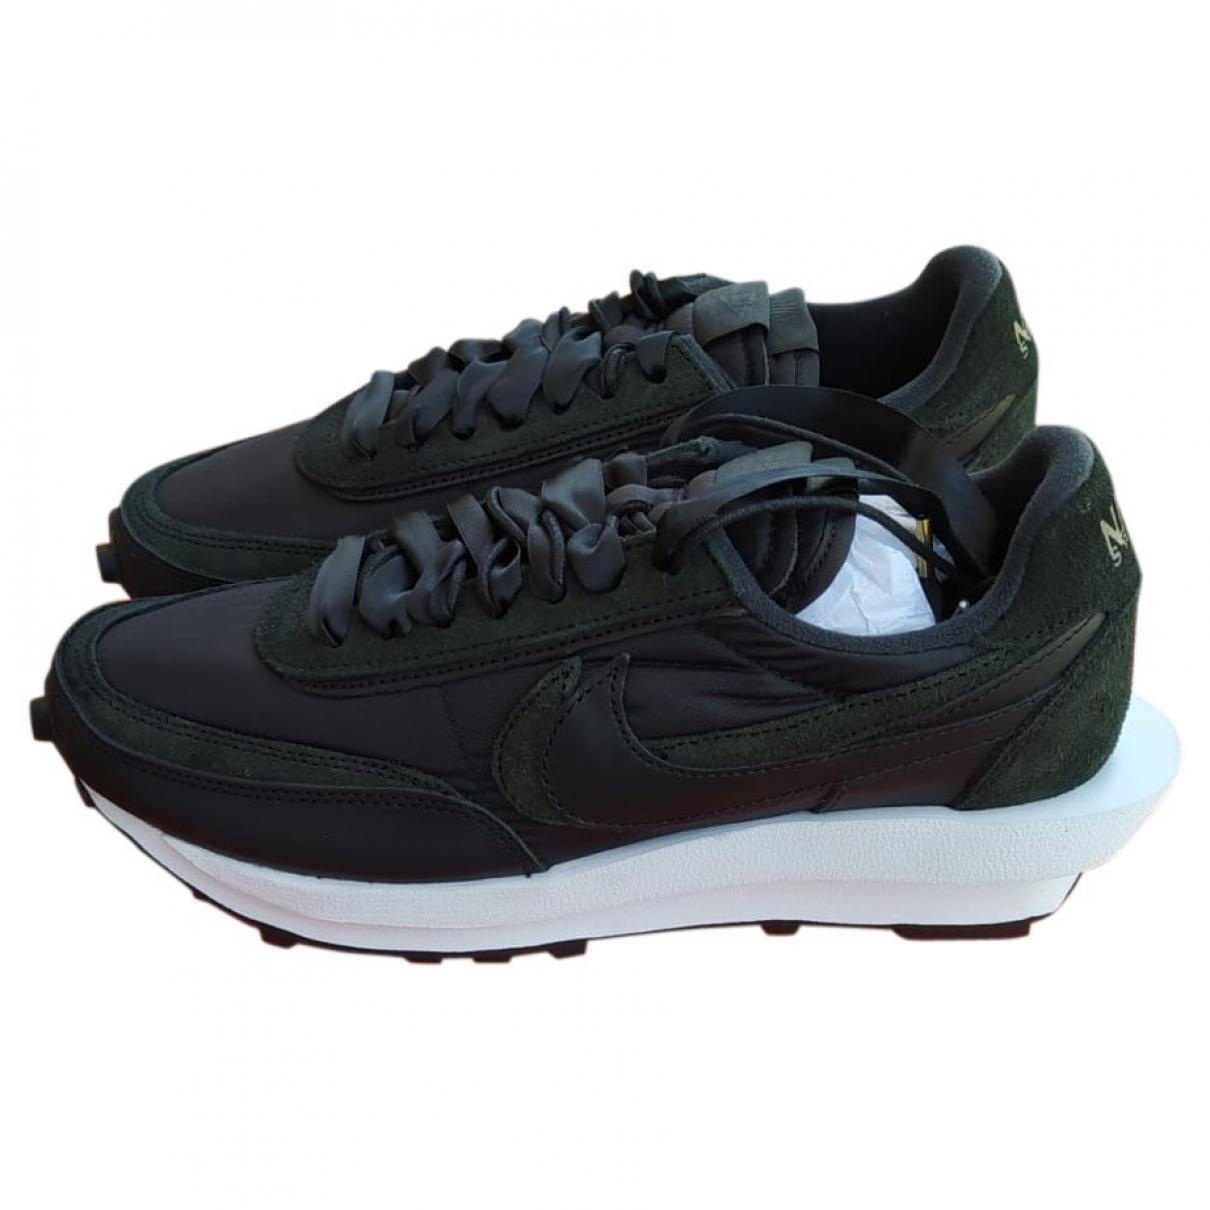 Nike X Sacaï LDV Waffle Black Trainers for Men 42.5 EU